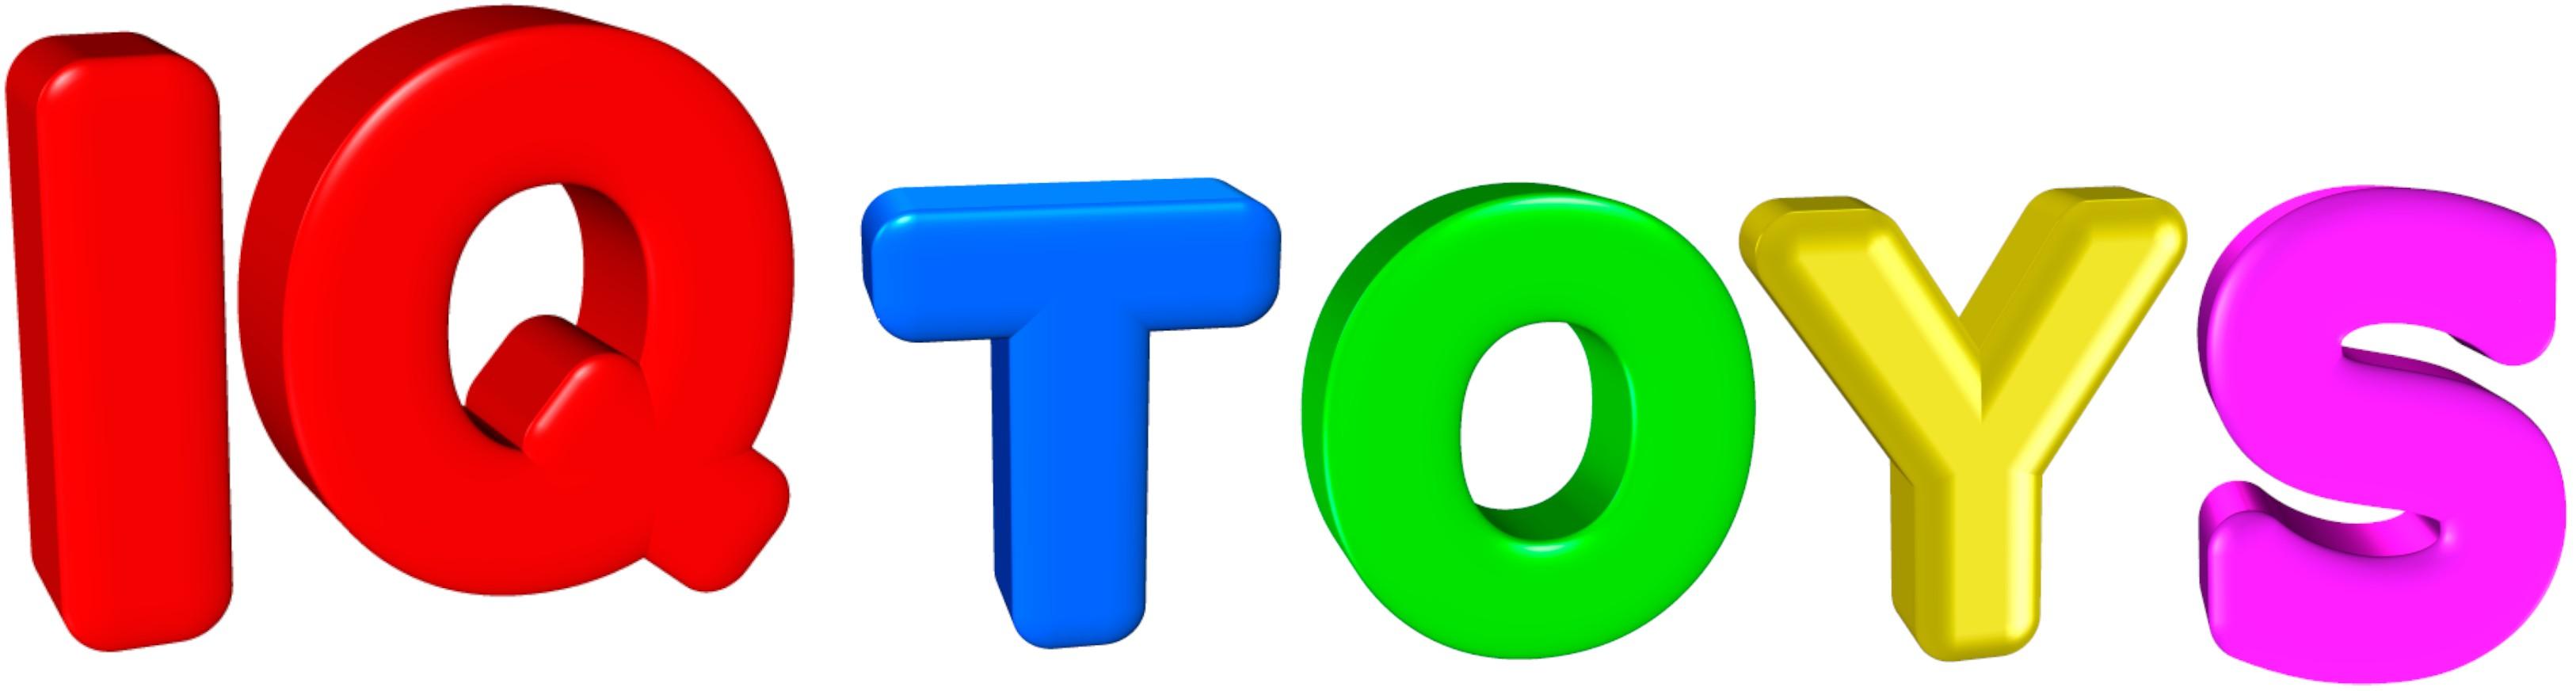 IQTOY - правильные игрушки